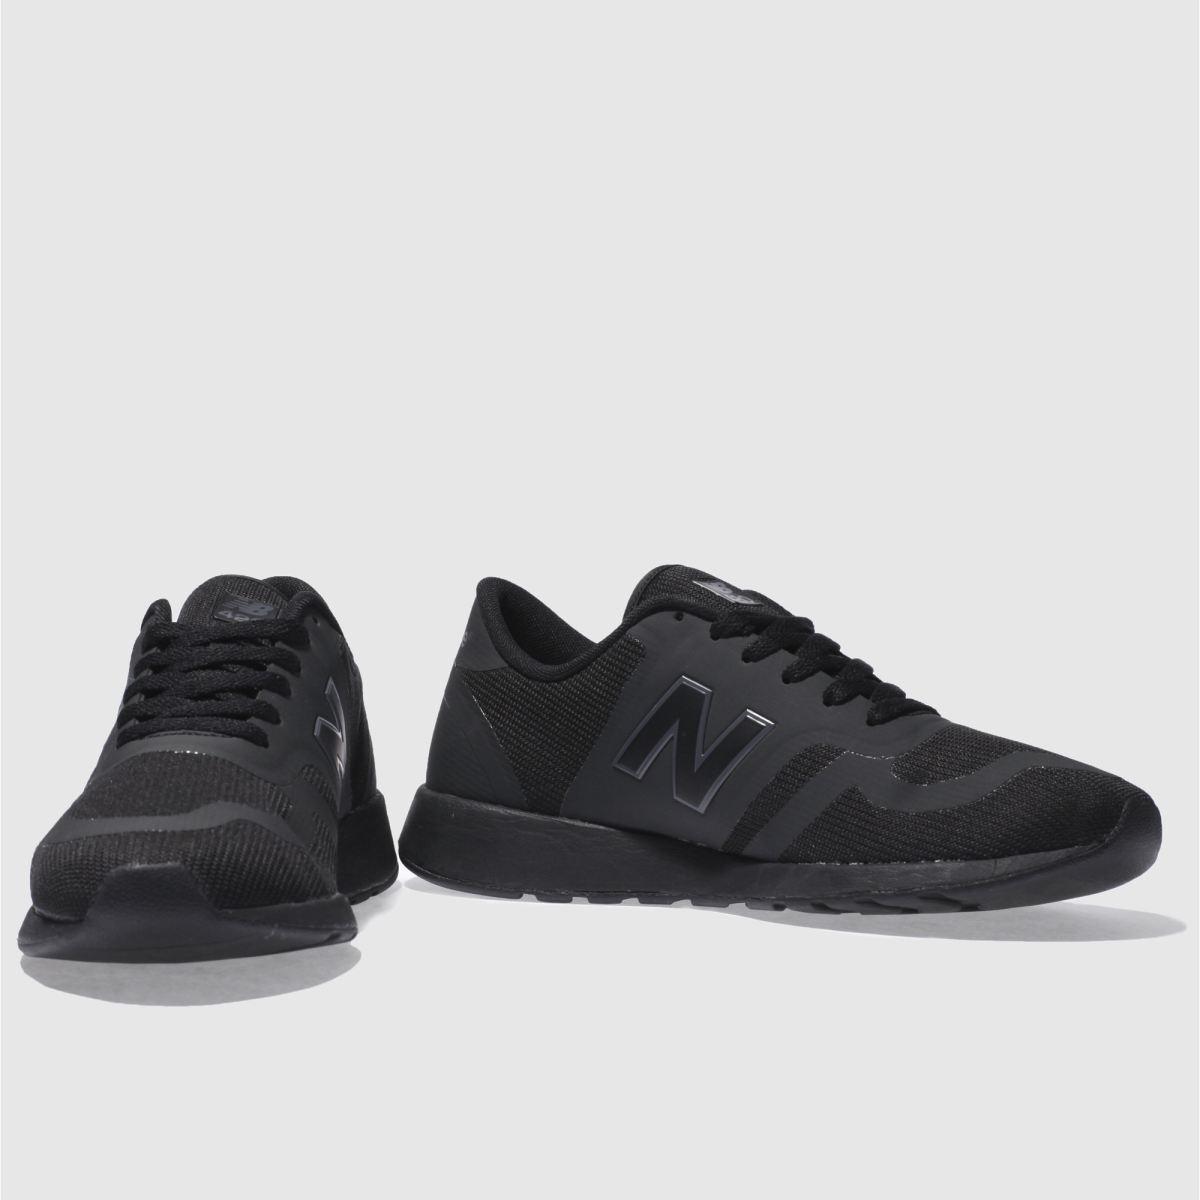 Herren new balance Sneaker | schuh Gute Qualität beliebte